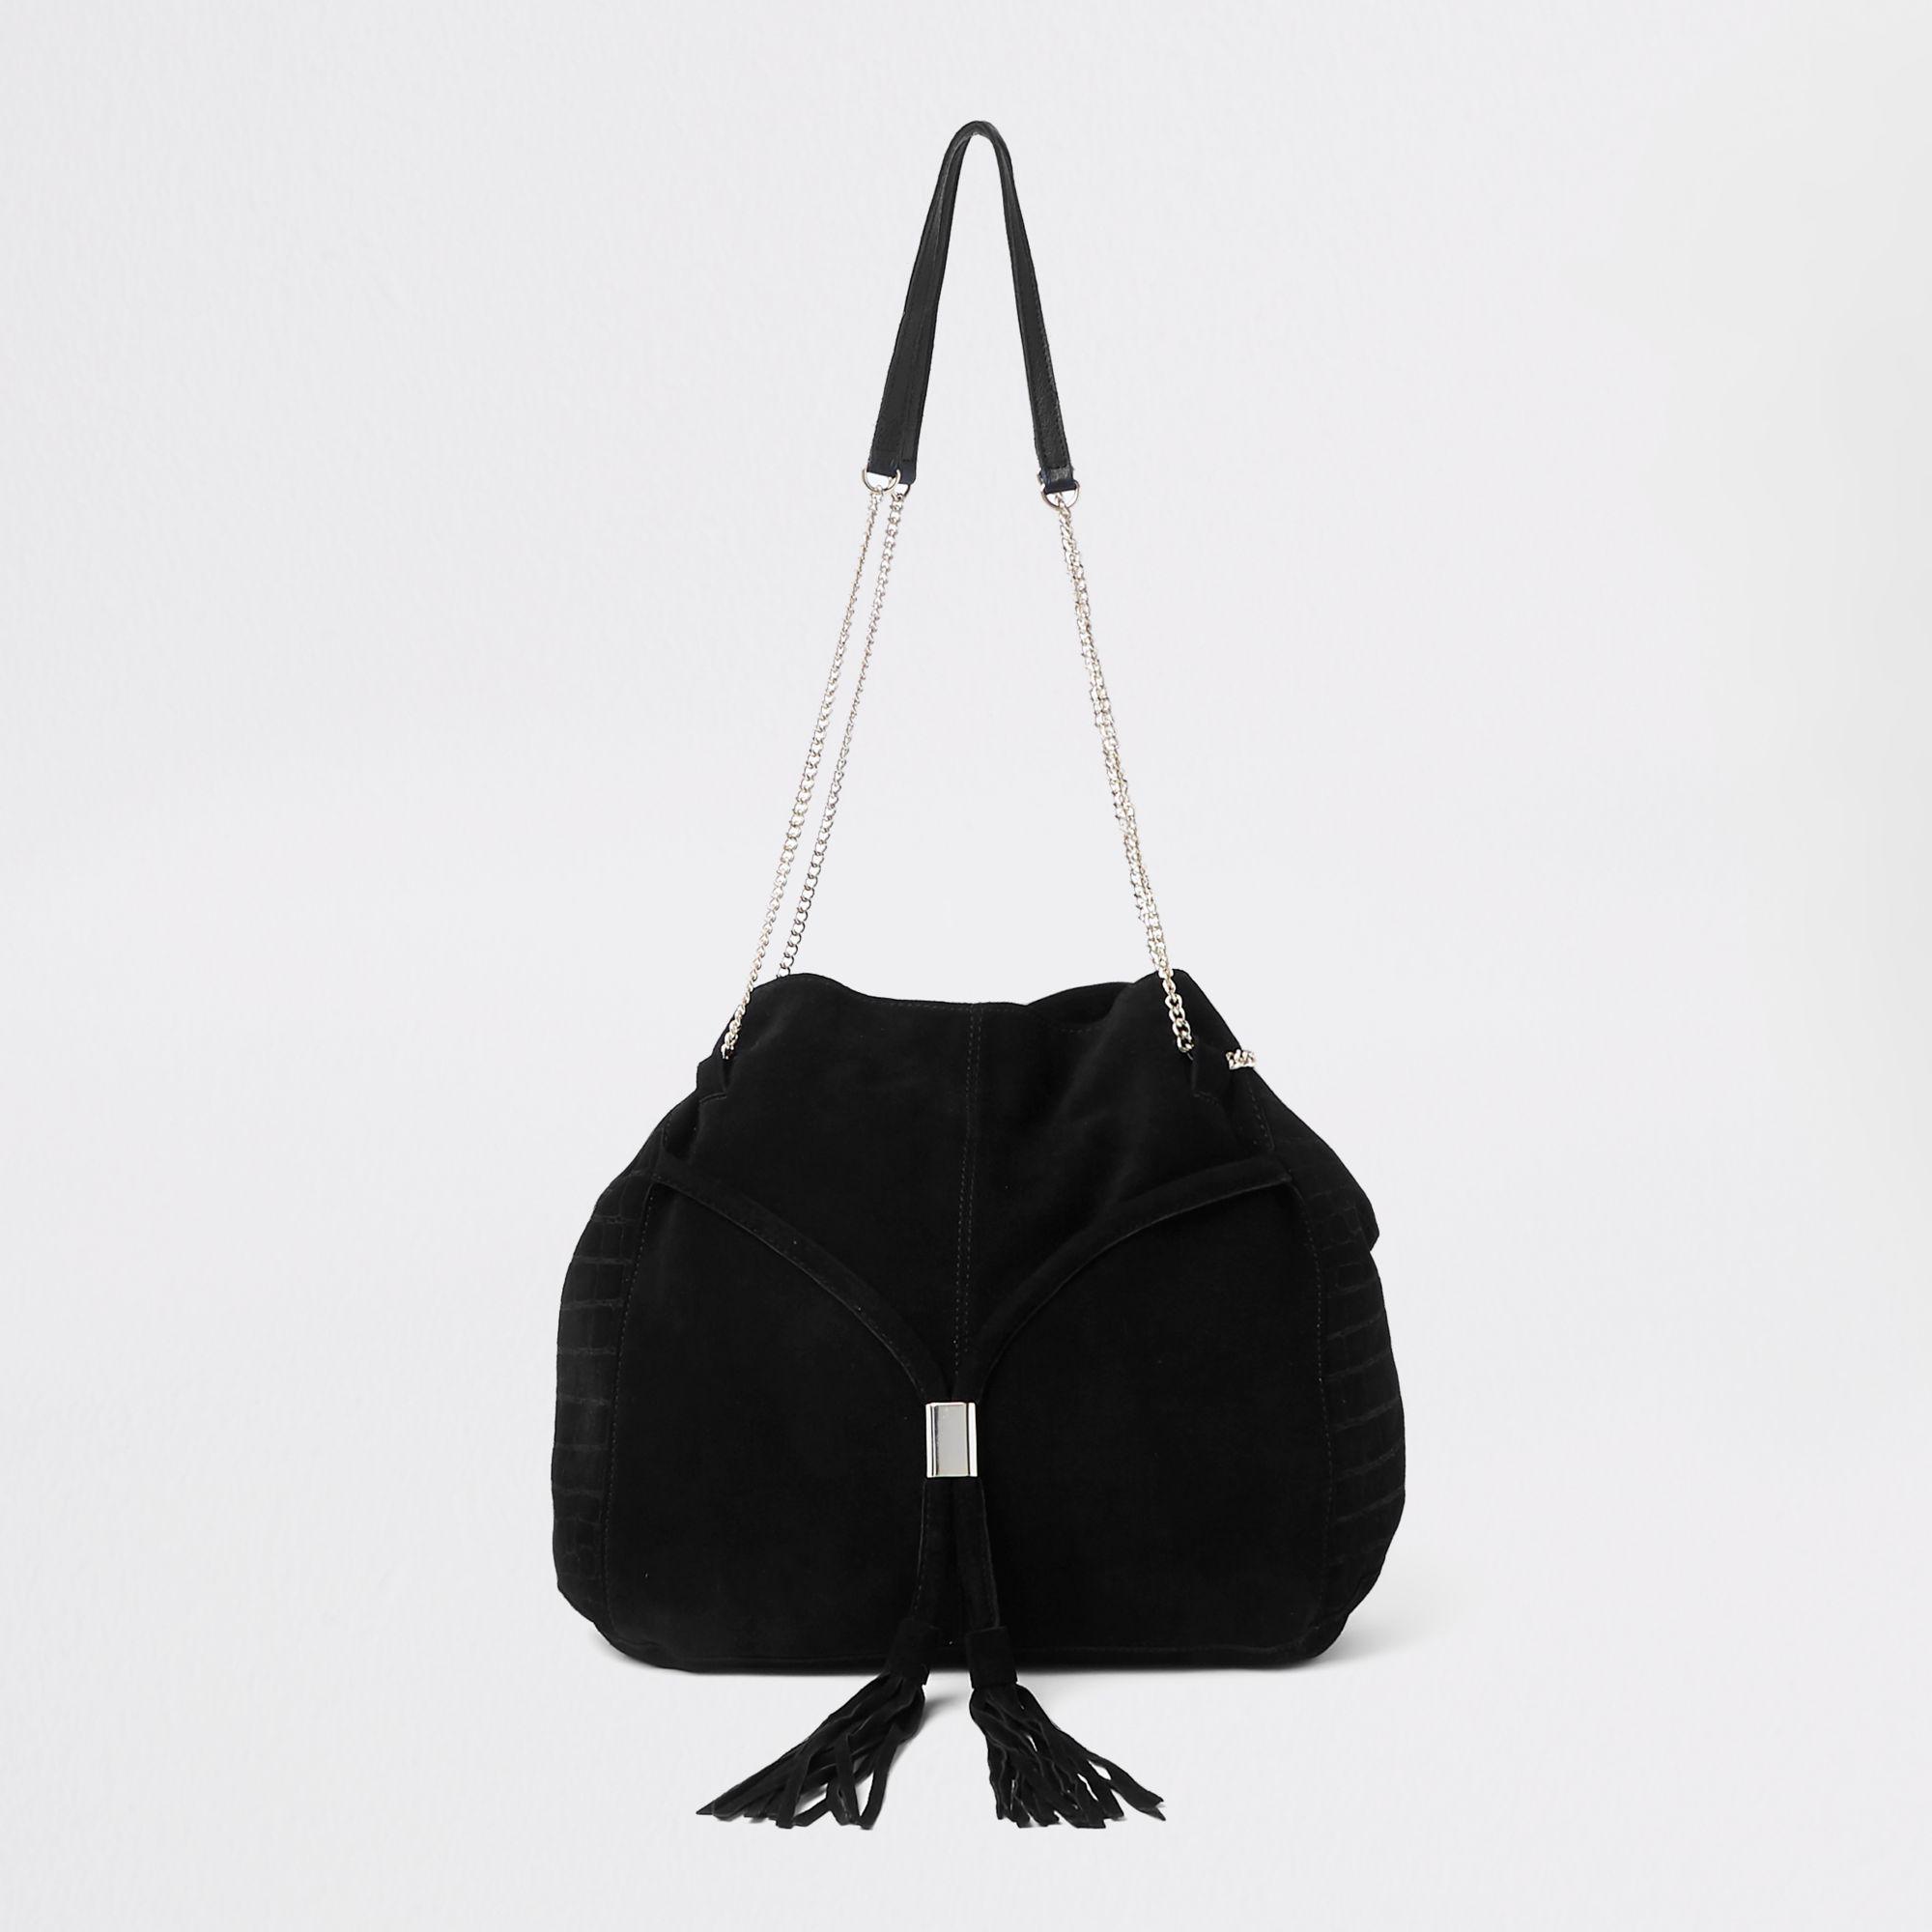 800da95177 River Island Leather Gold Tone Chain Handle Tote Bag in Black - Lyst